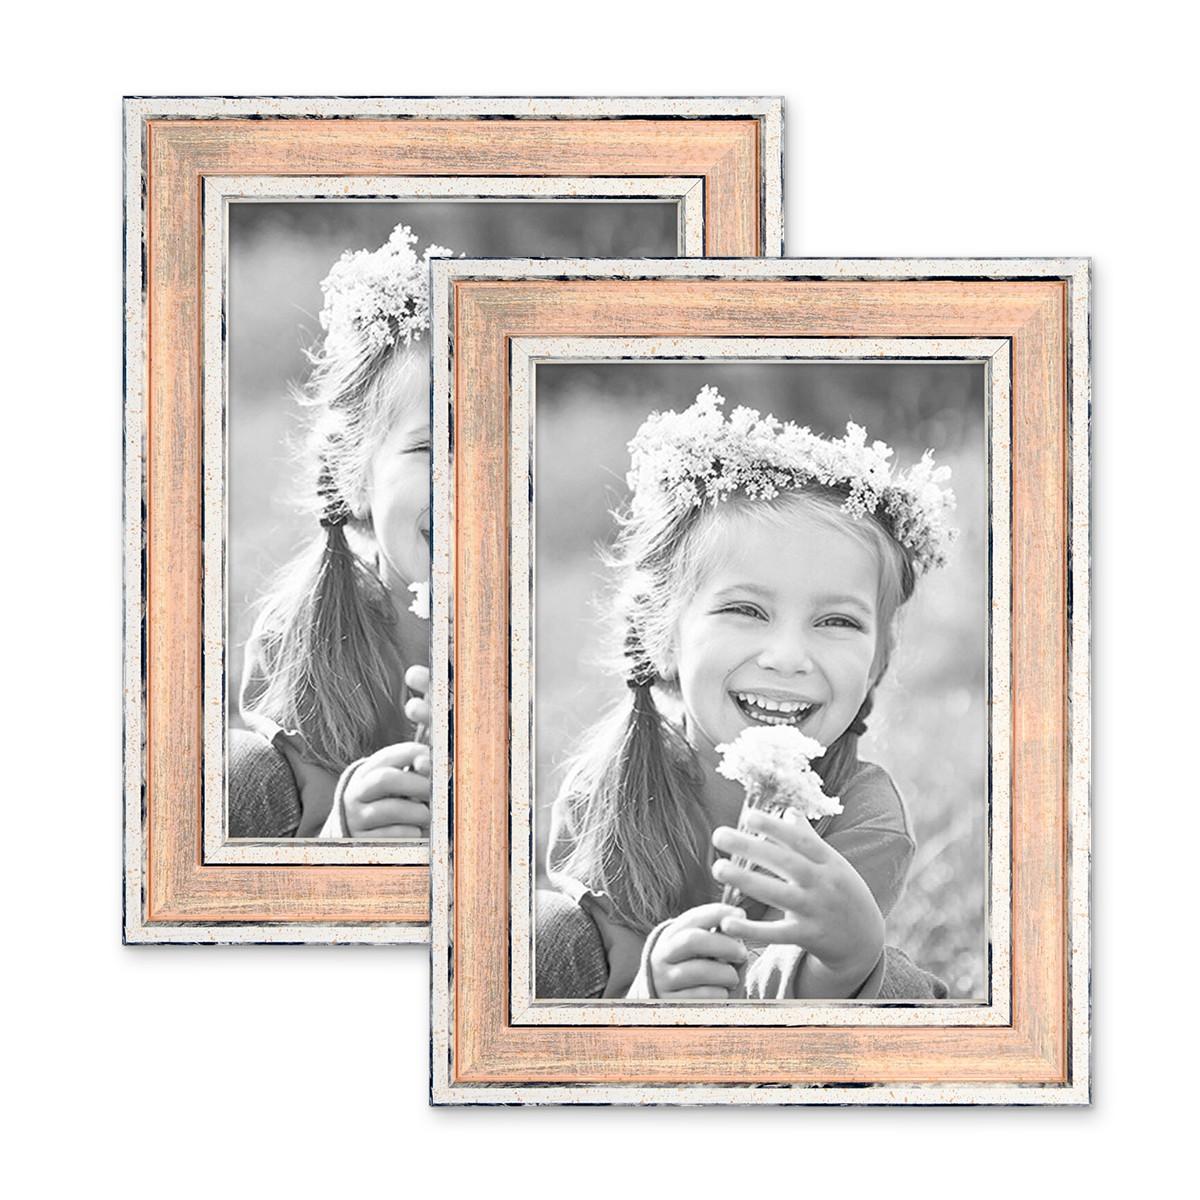 2er Set Bilderrahmen Pastell / Alt-Weiß Rosa 13x18 cm Massivholz mit ...